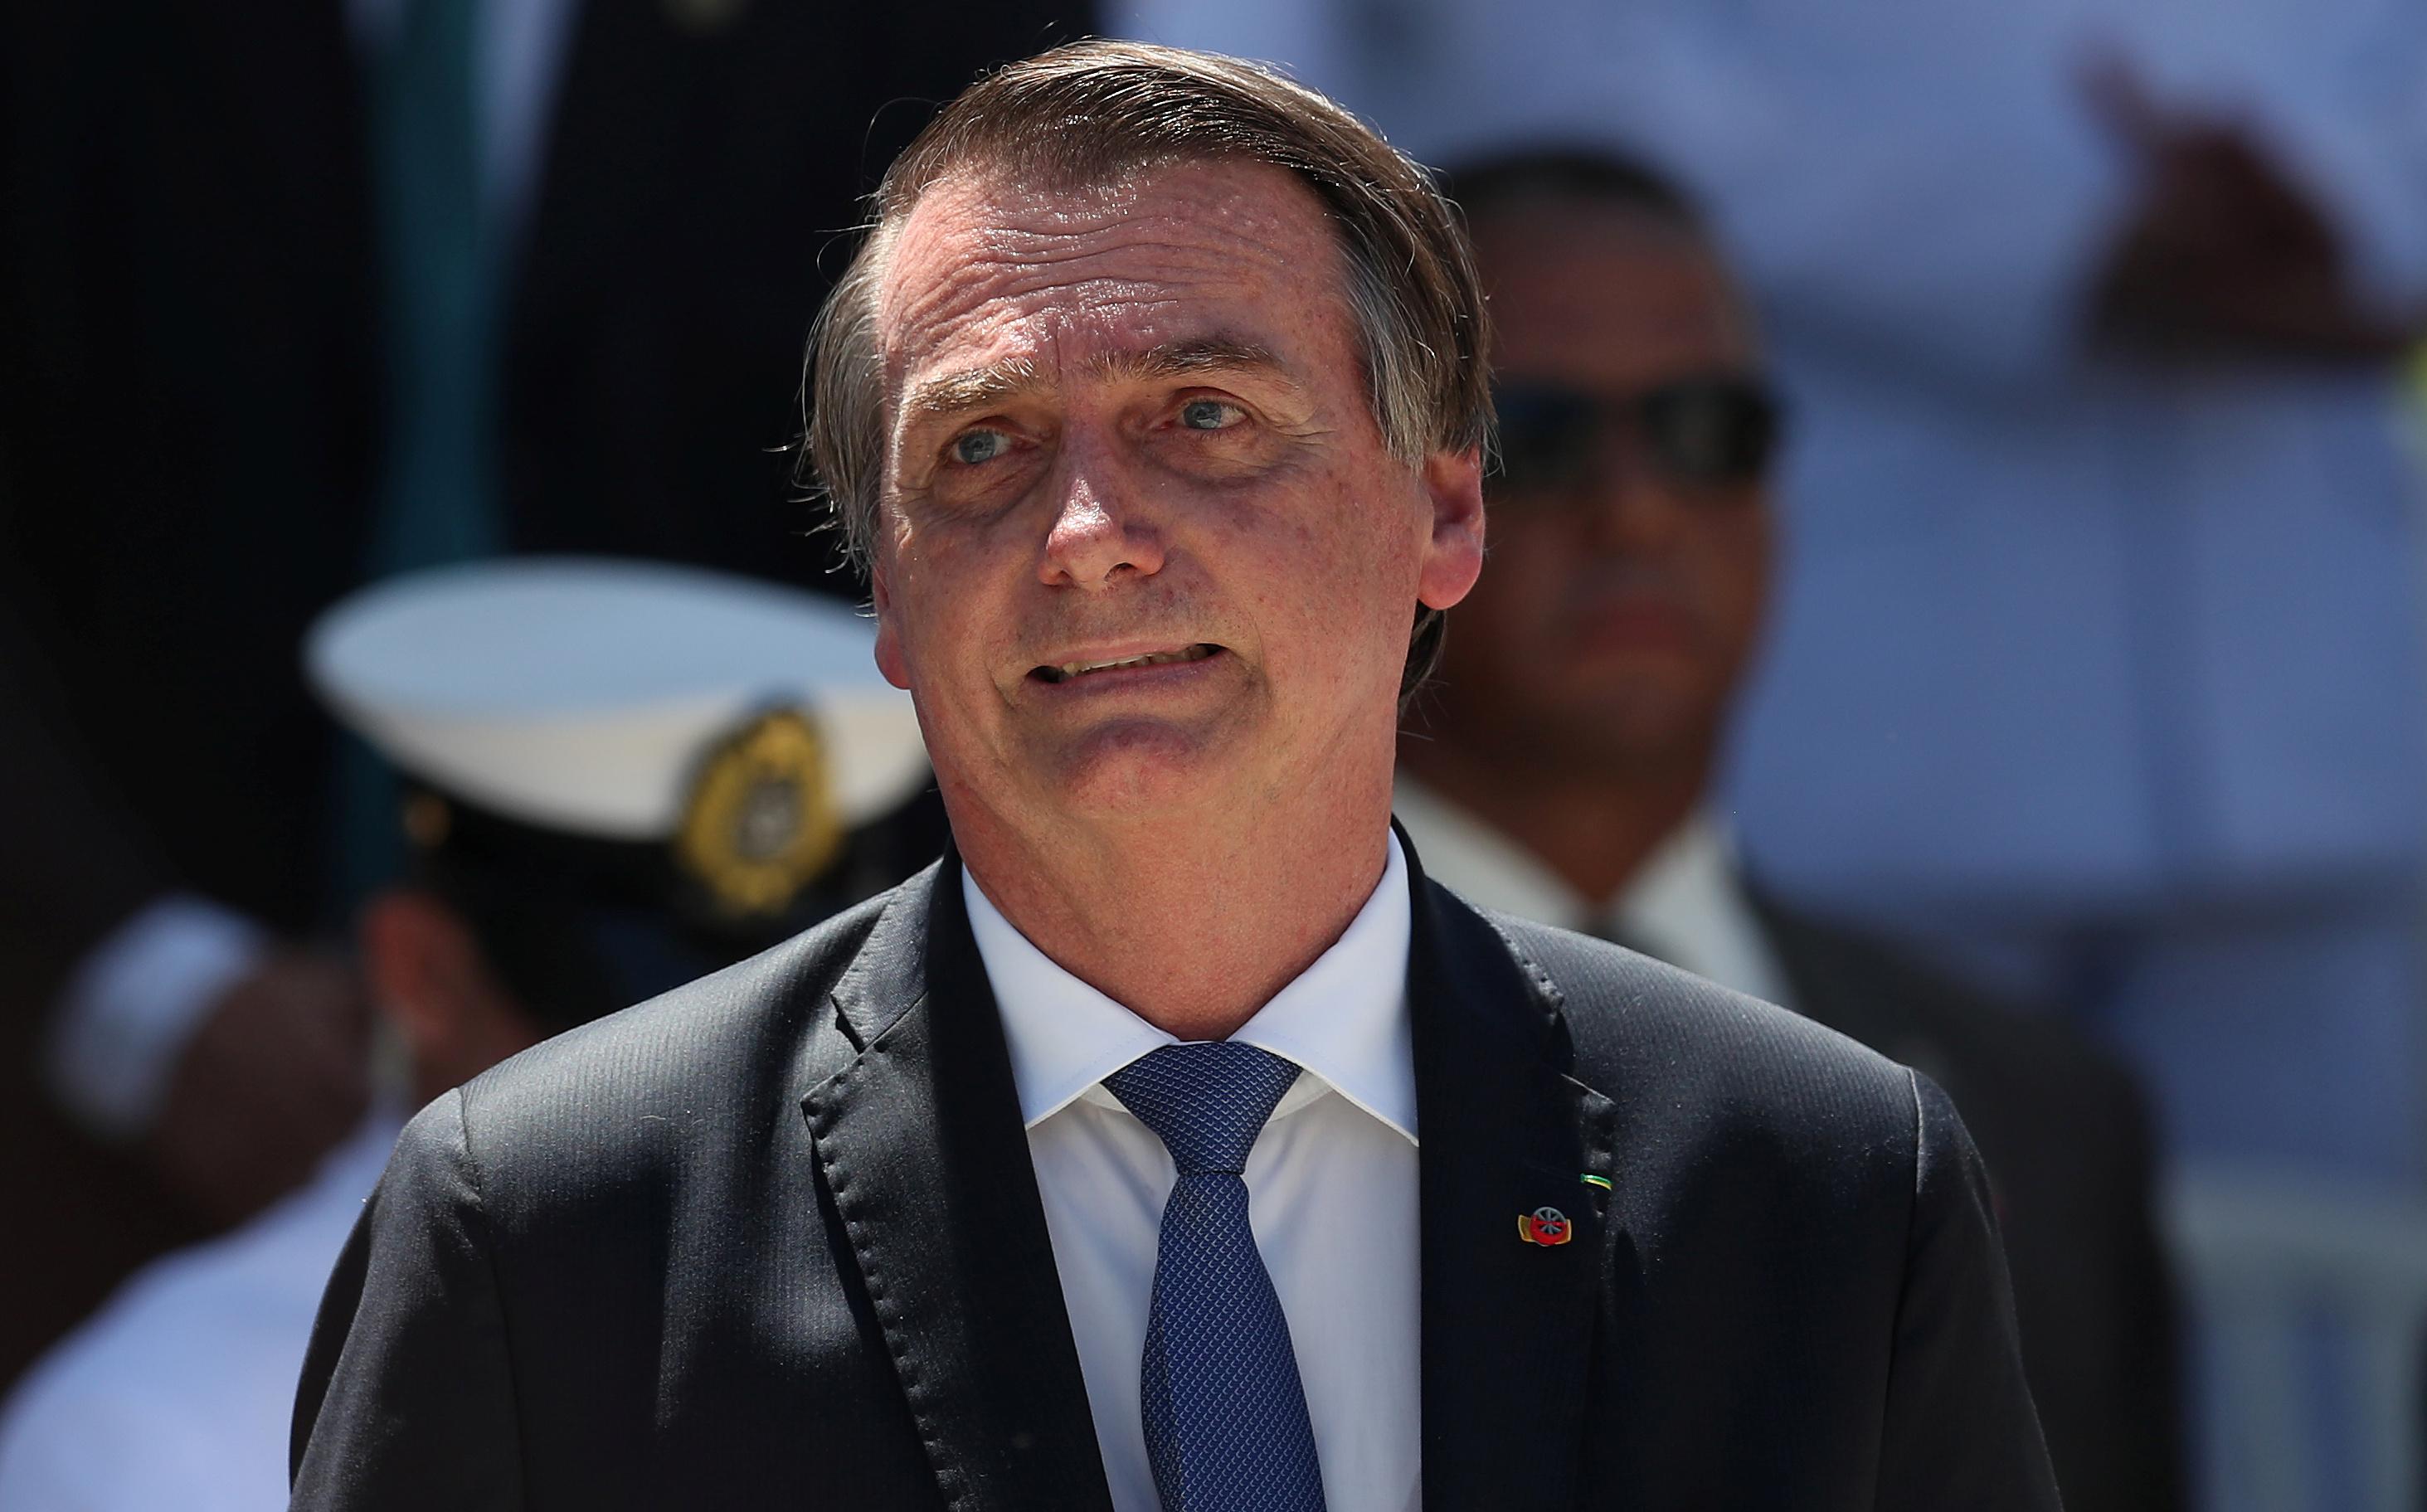 El presidente de Brasil, Jair Bolsonaro (REUTERS/Ricardo Moraes)